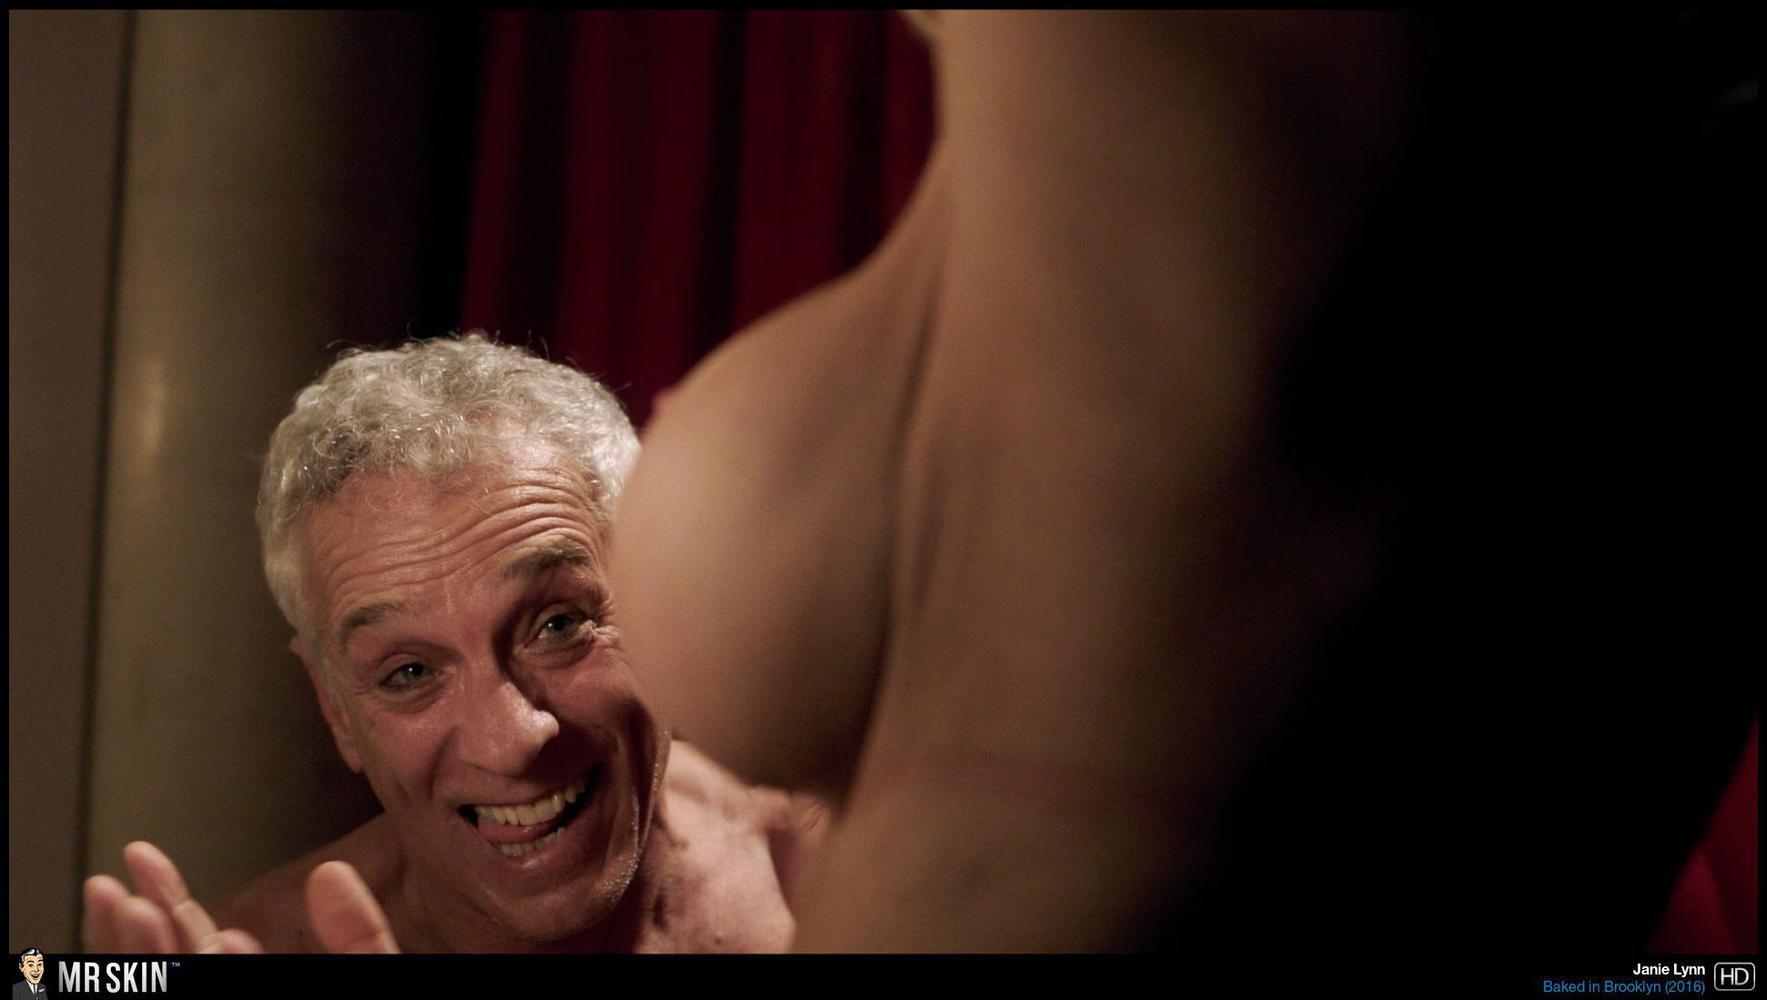 Alexandra daddario baked in brooklyn nude nudes (18 pic)